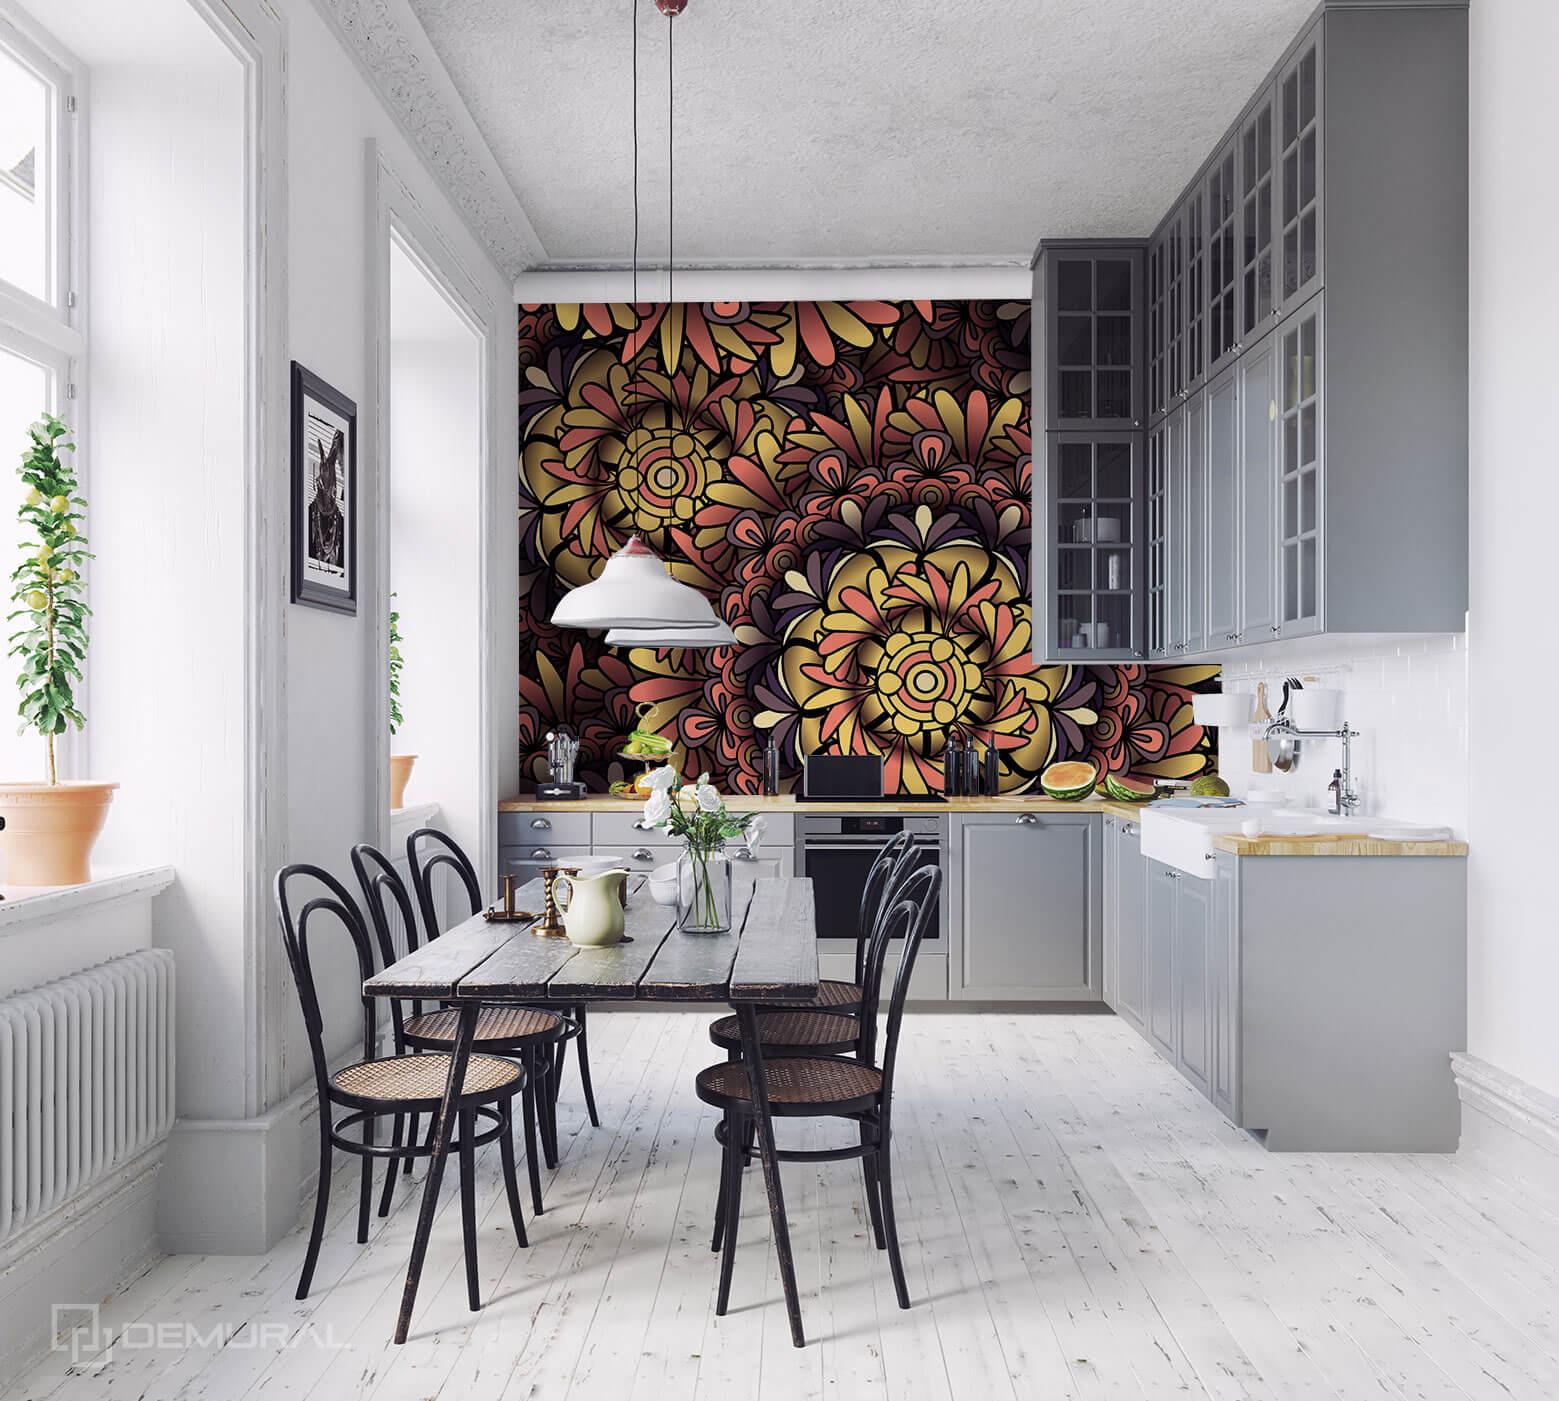 Photo wallpaper Stylish mandala - Photo wallpaper in big kitchen - Demural